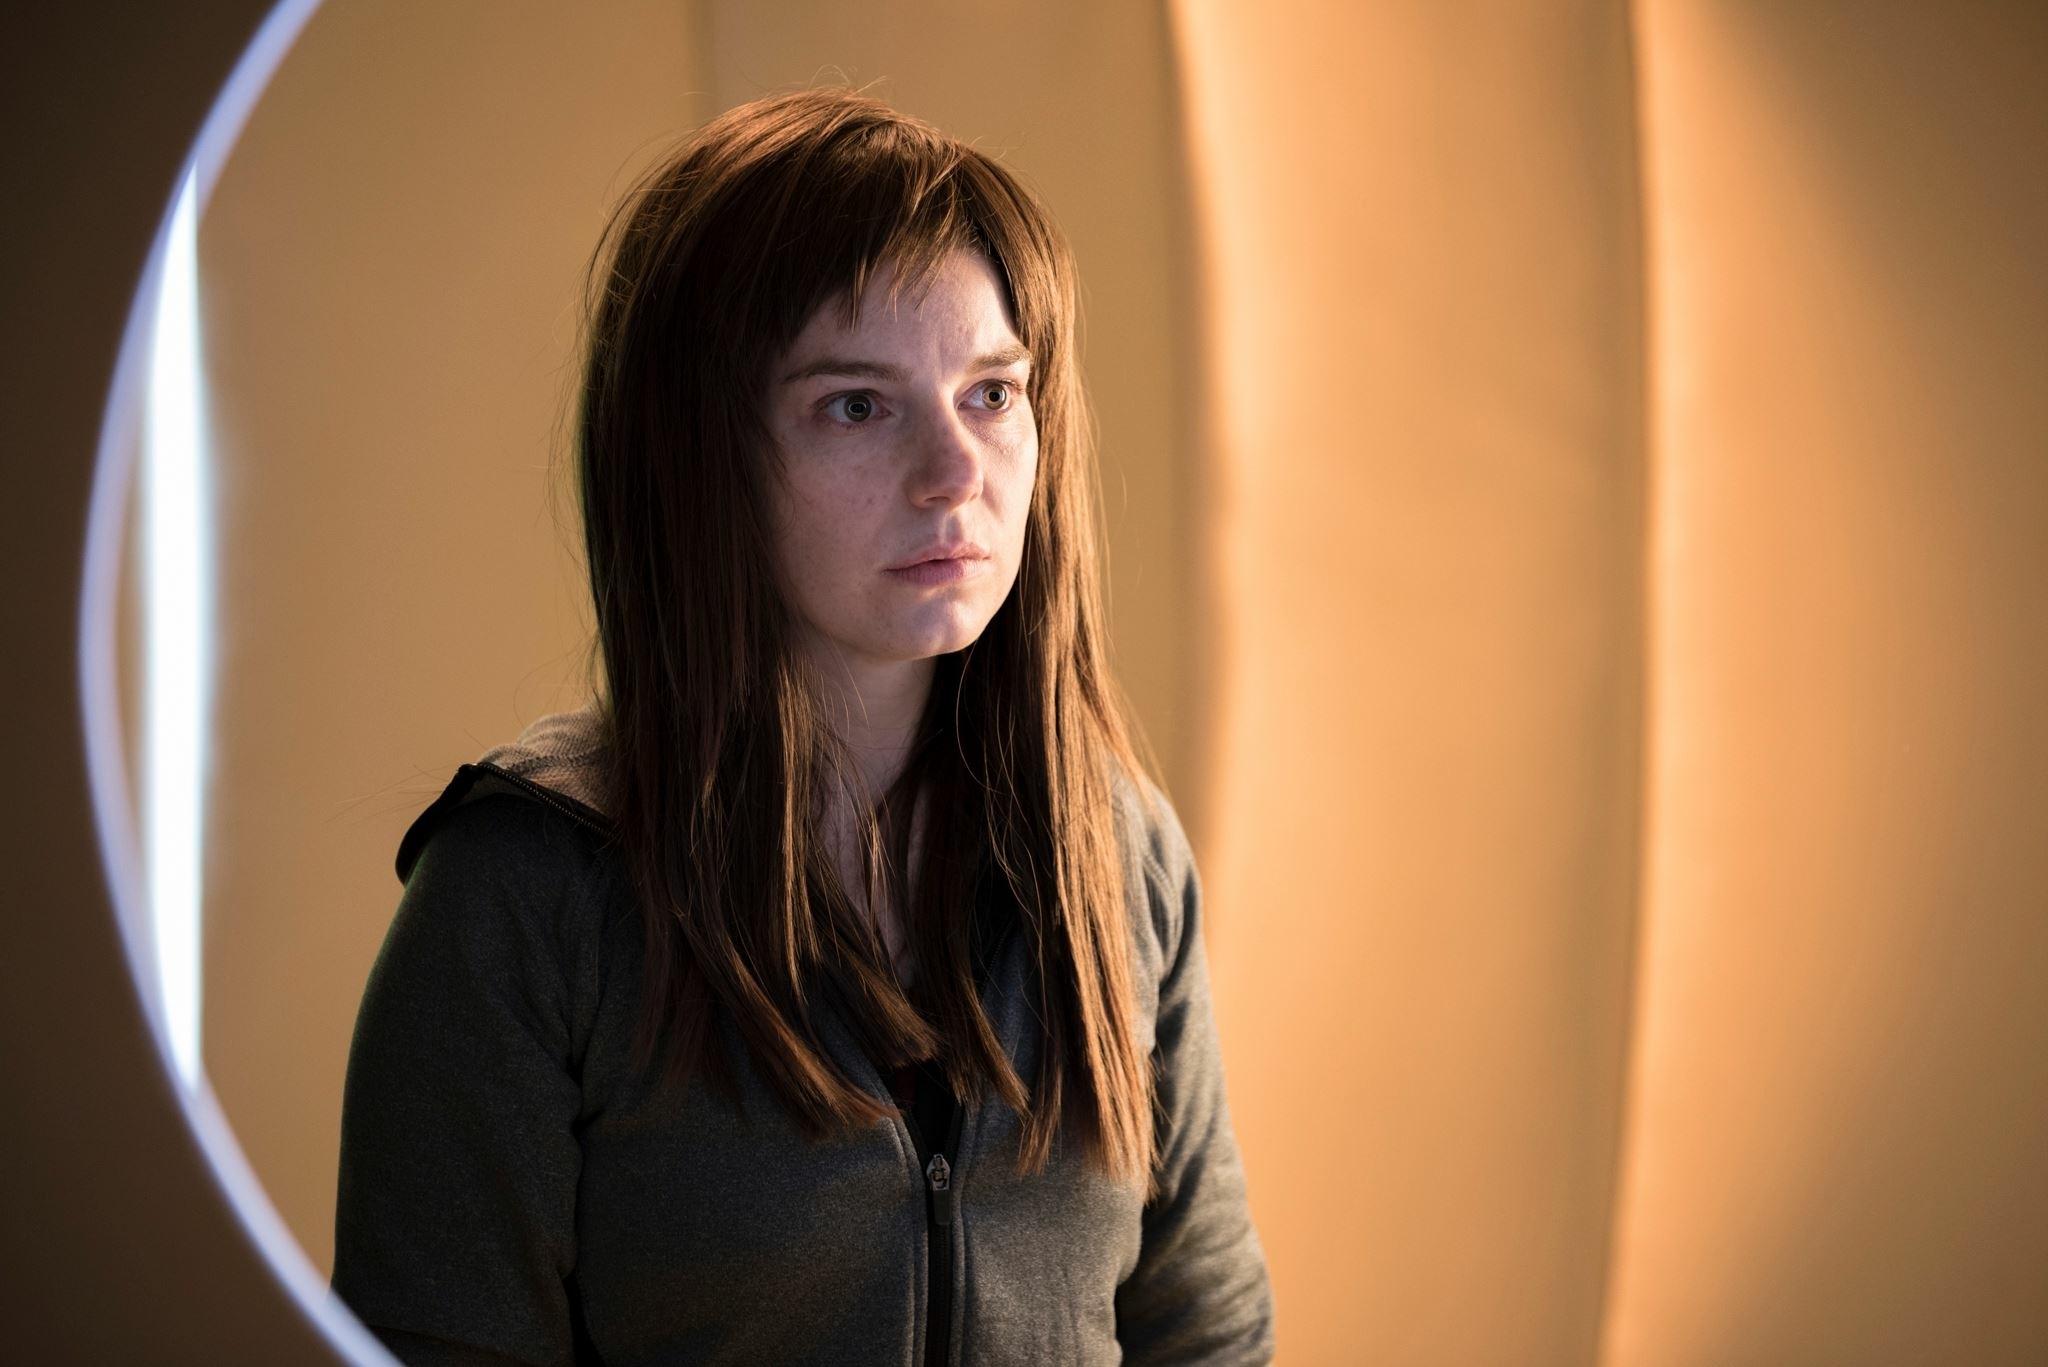 Aimee-Ffion Edwards as Ruth Sharman in Long Arm Films' Zero Sum  Photo © Lewis Gillingham  / Long Arm Films 2016